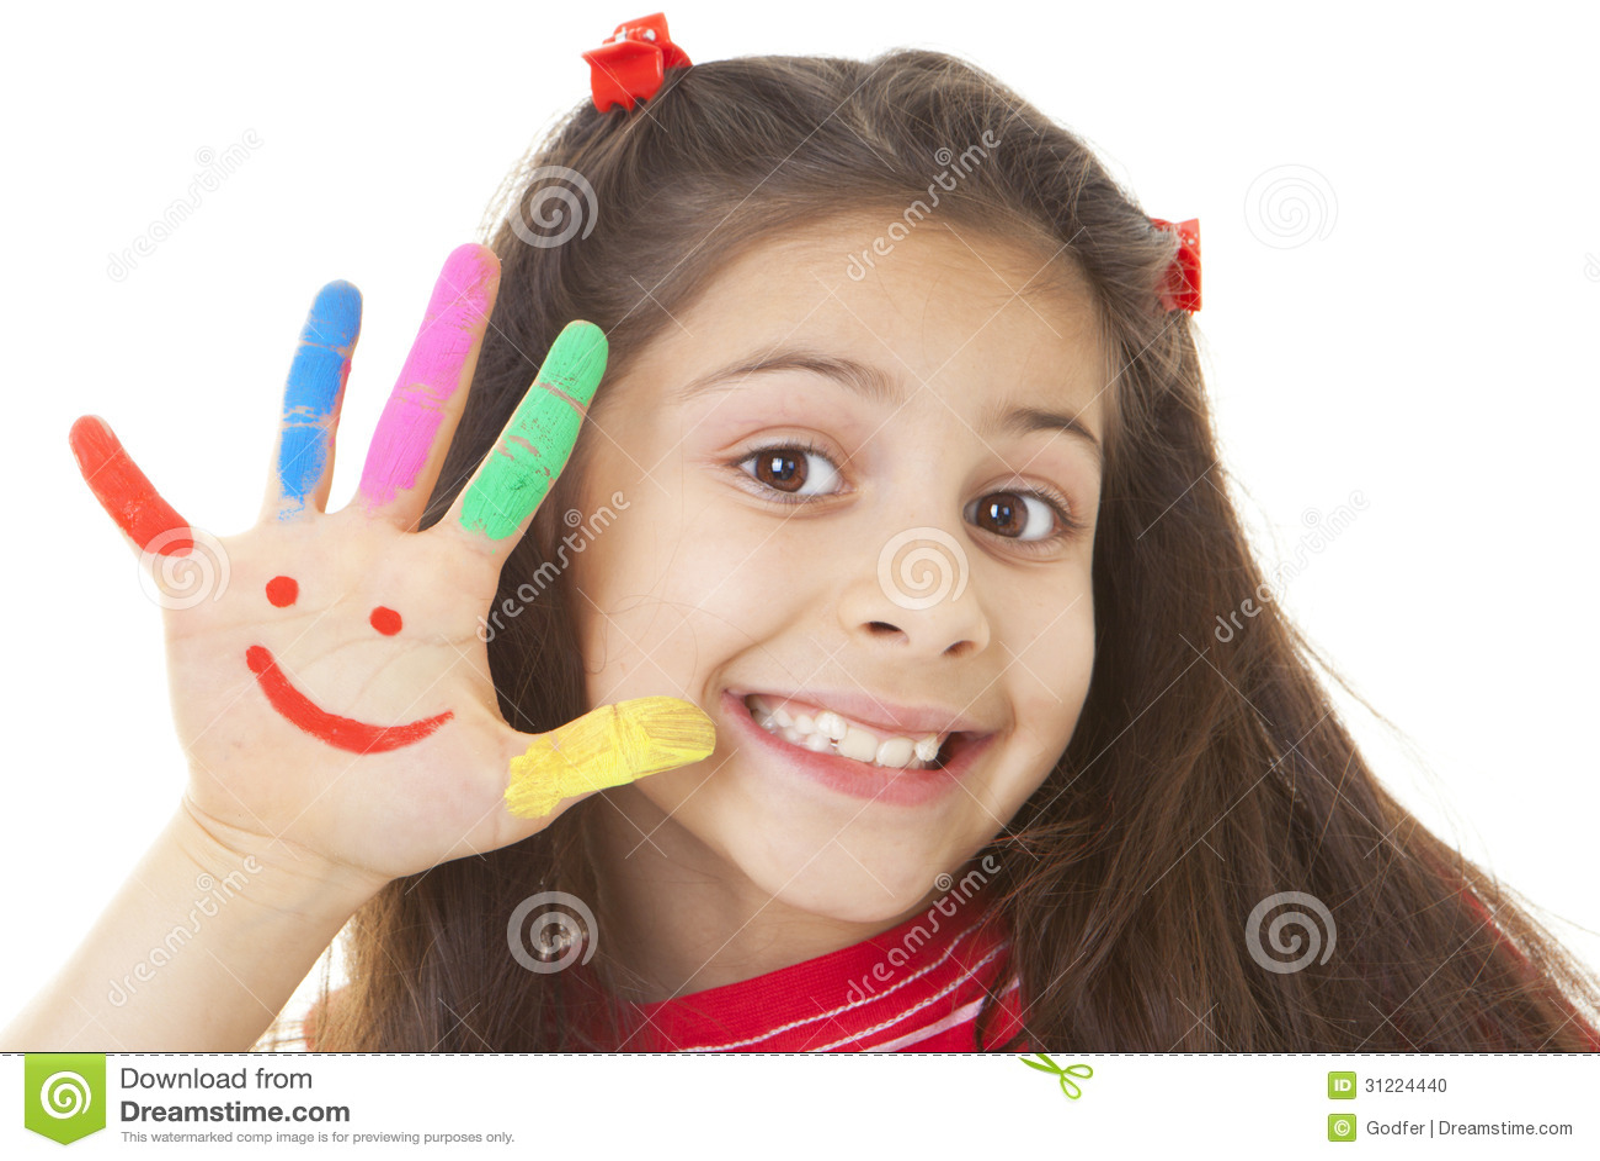 Smile, Smiling Kid Stock Photo - Image: 31224440